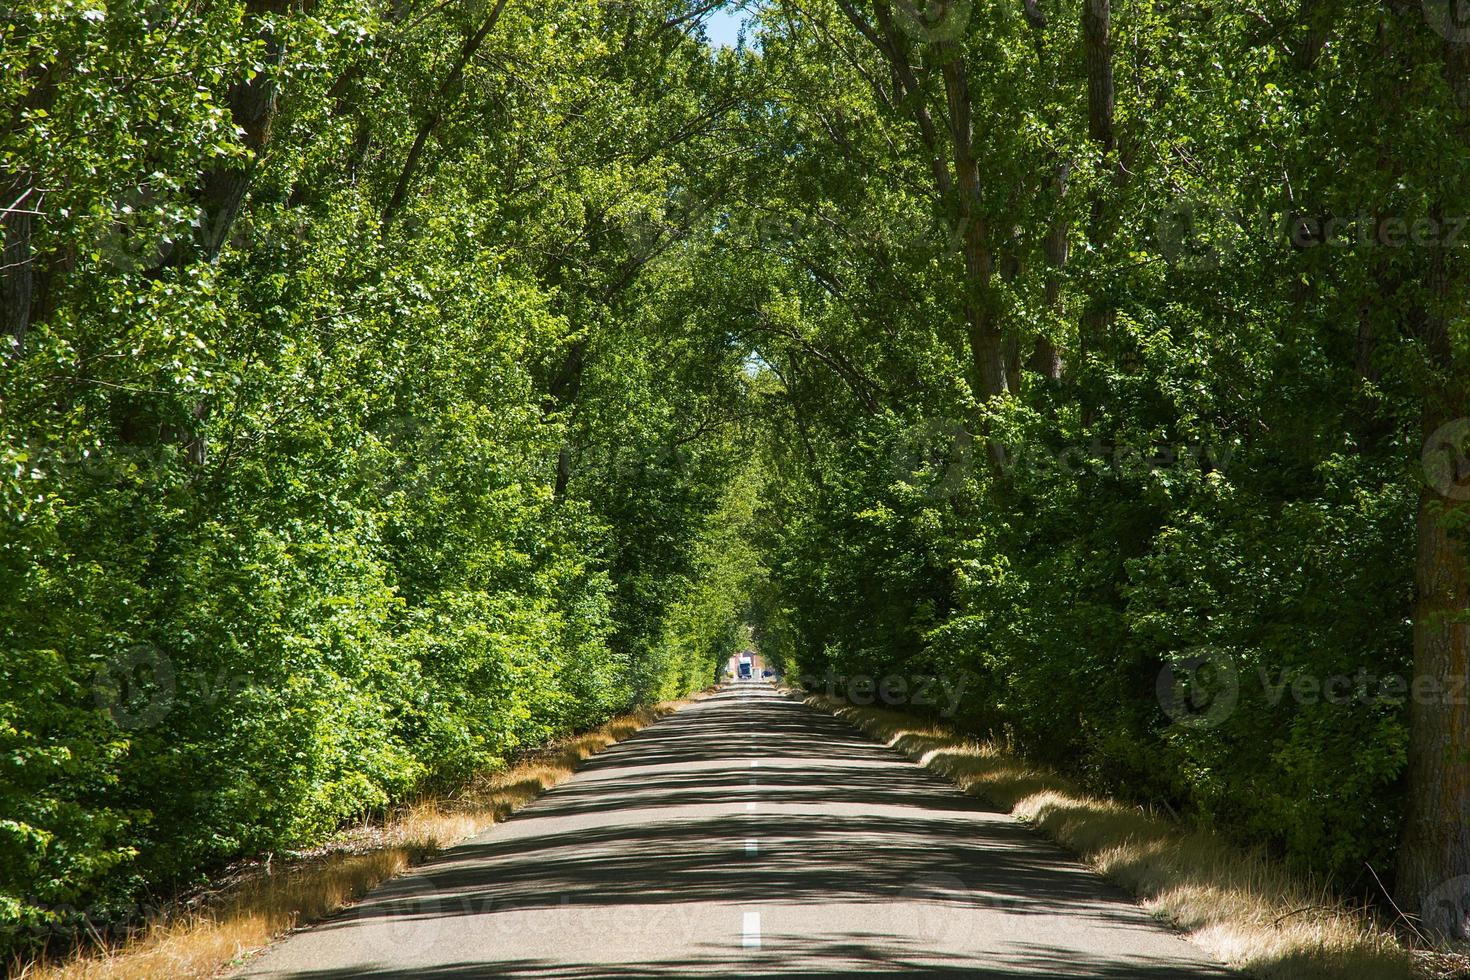 túnel do bosque na rodovia - tunel de arboleda en carretera foto